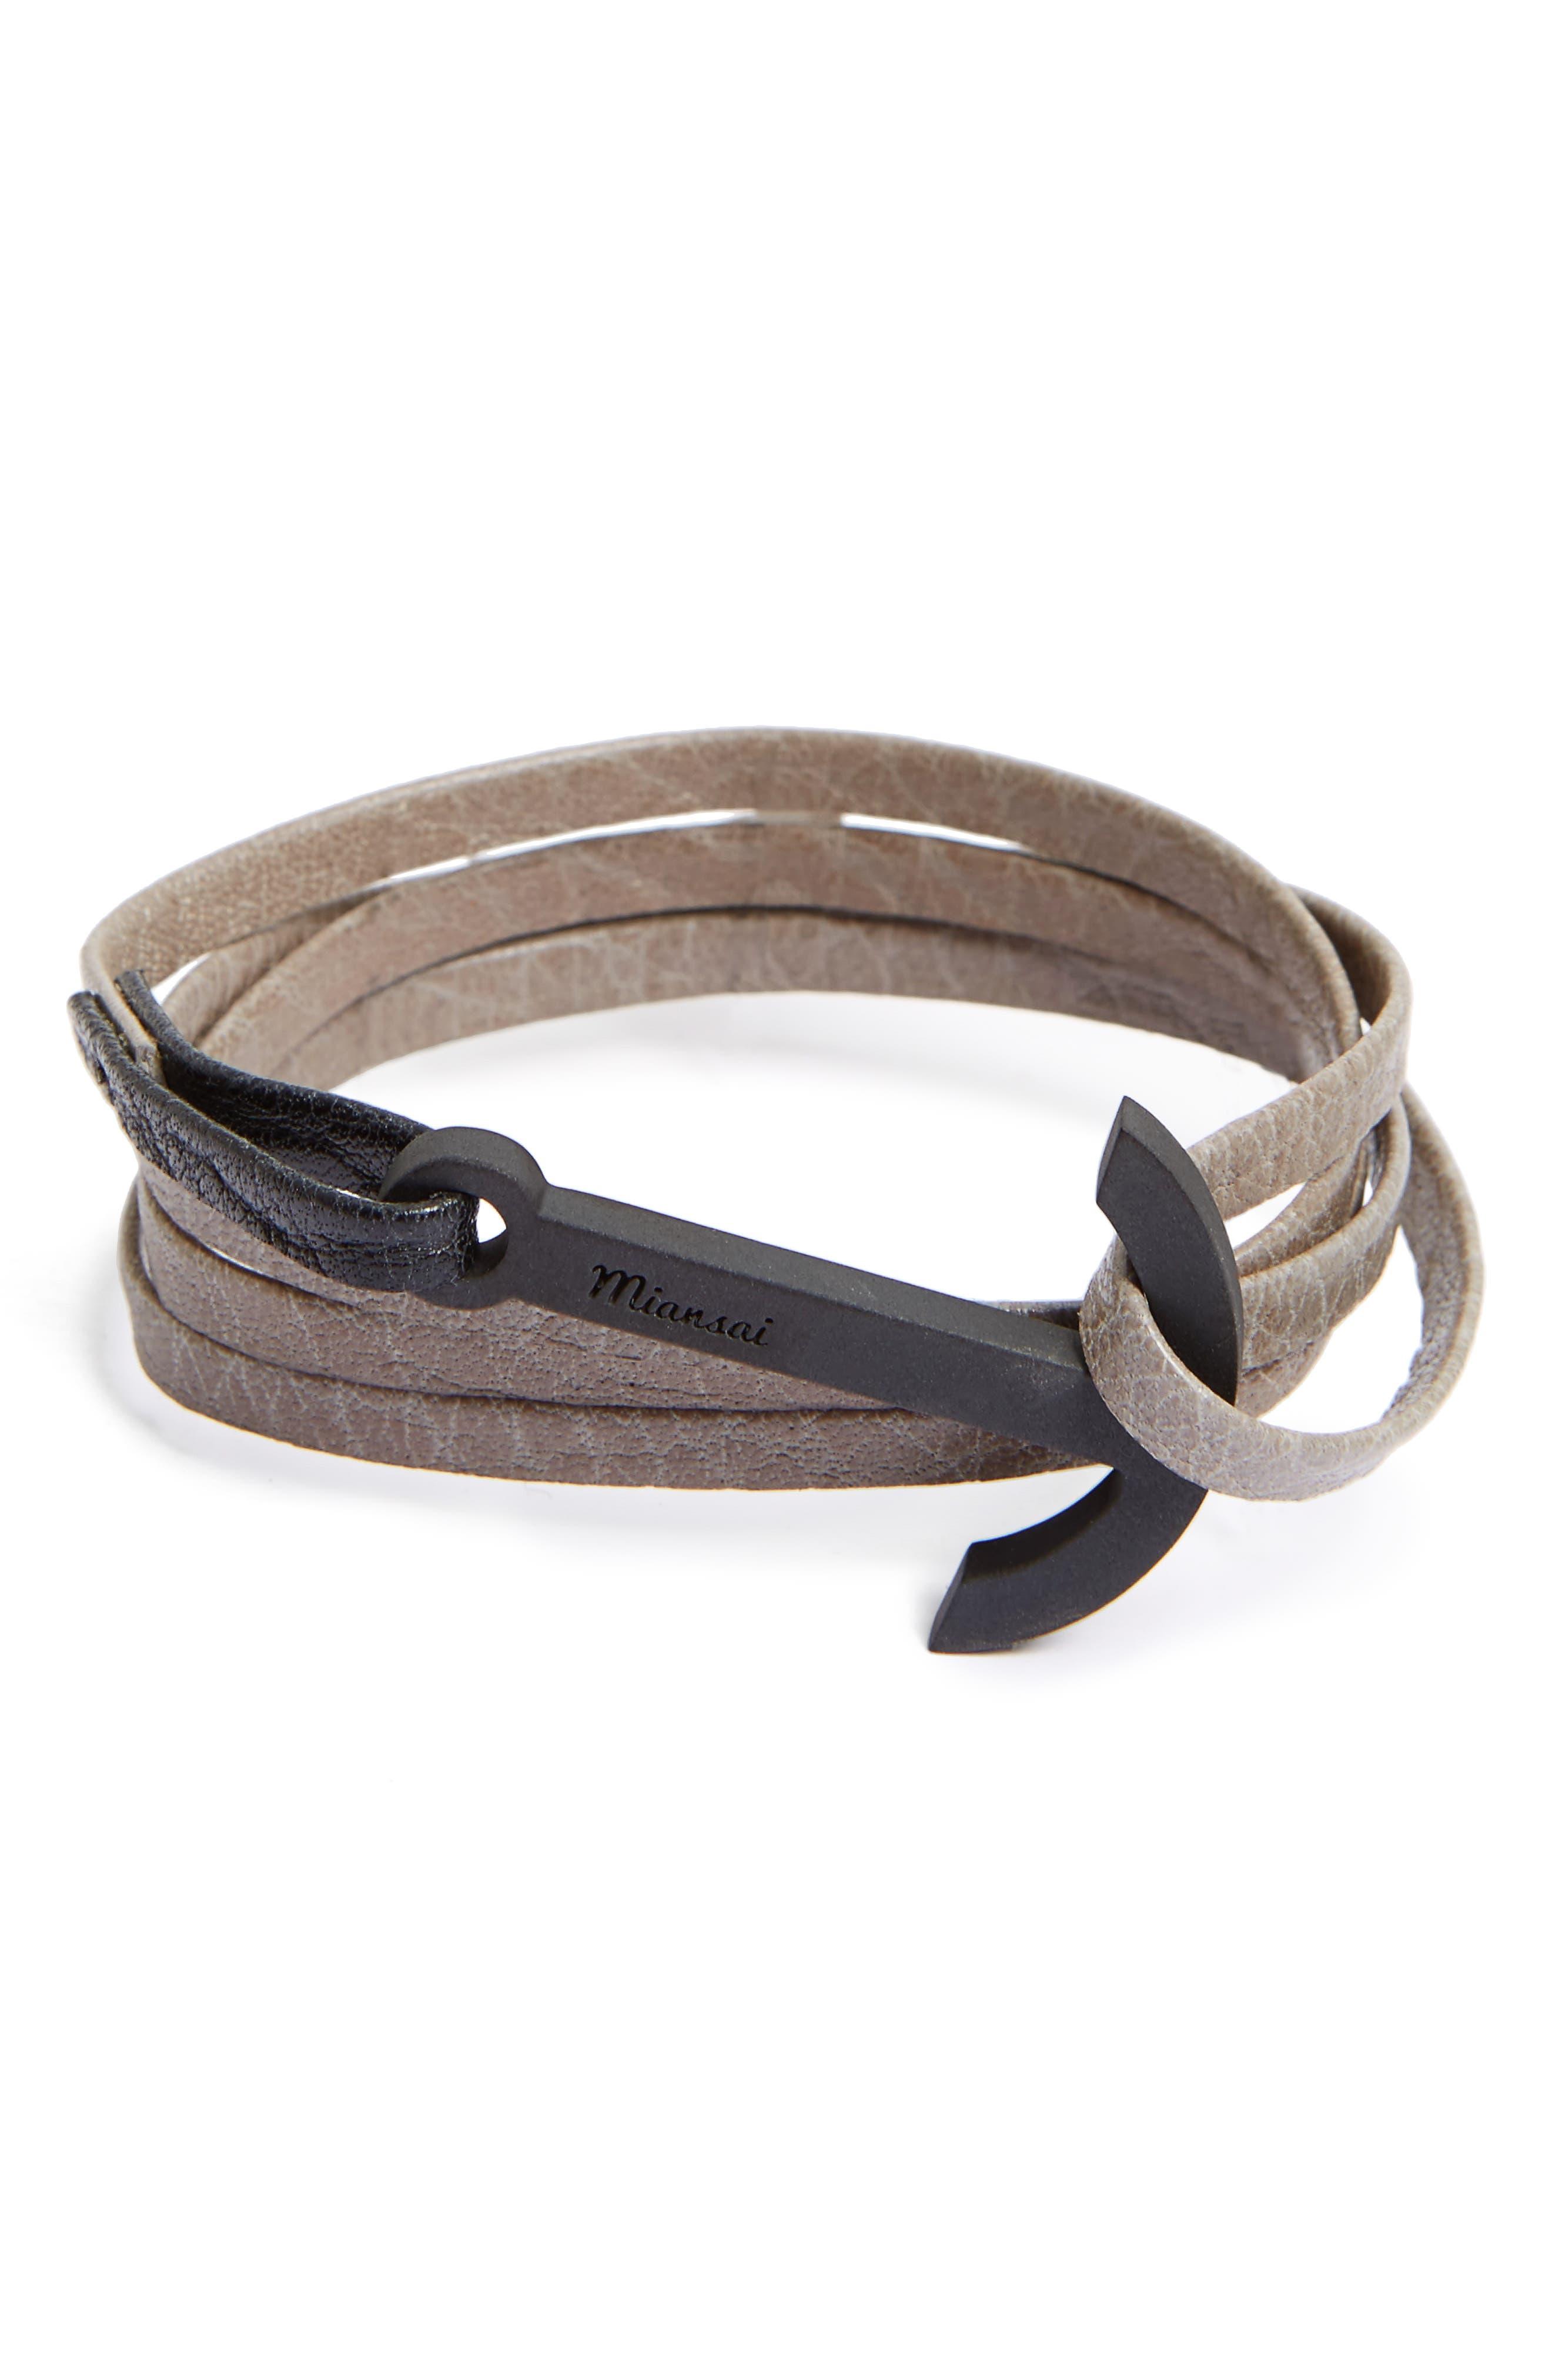 Modern Anchor Leather Wrap Bracelet,                         Main,                         color, Stone/ Black